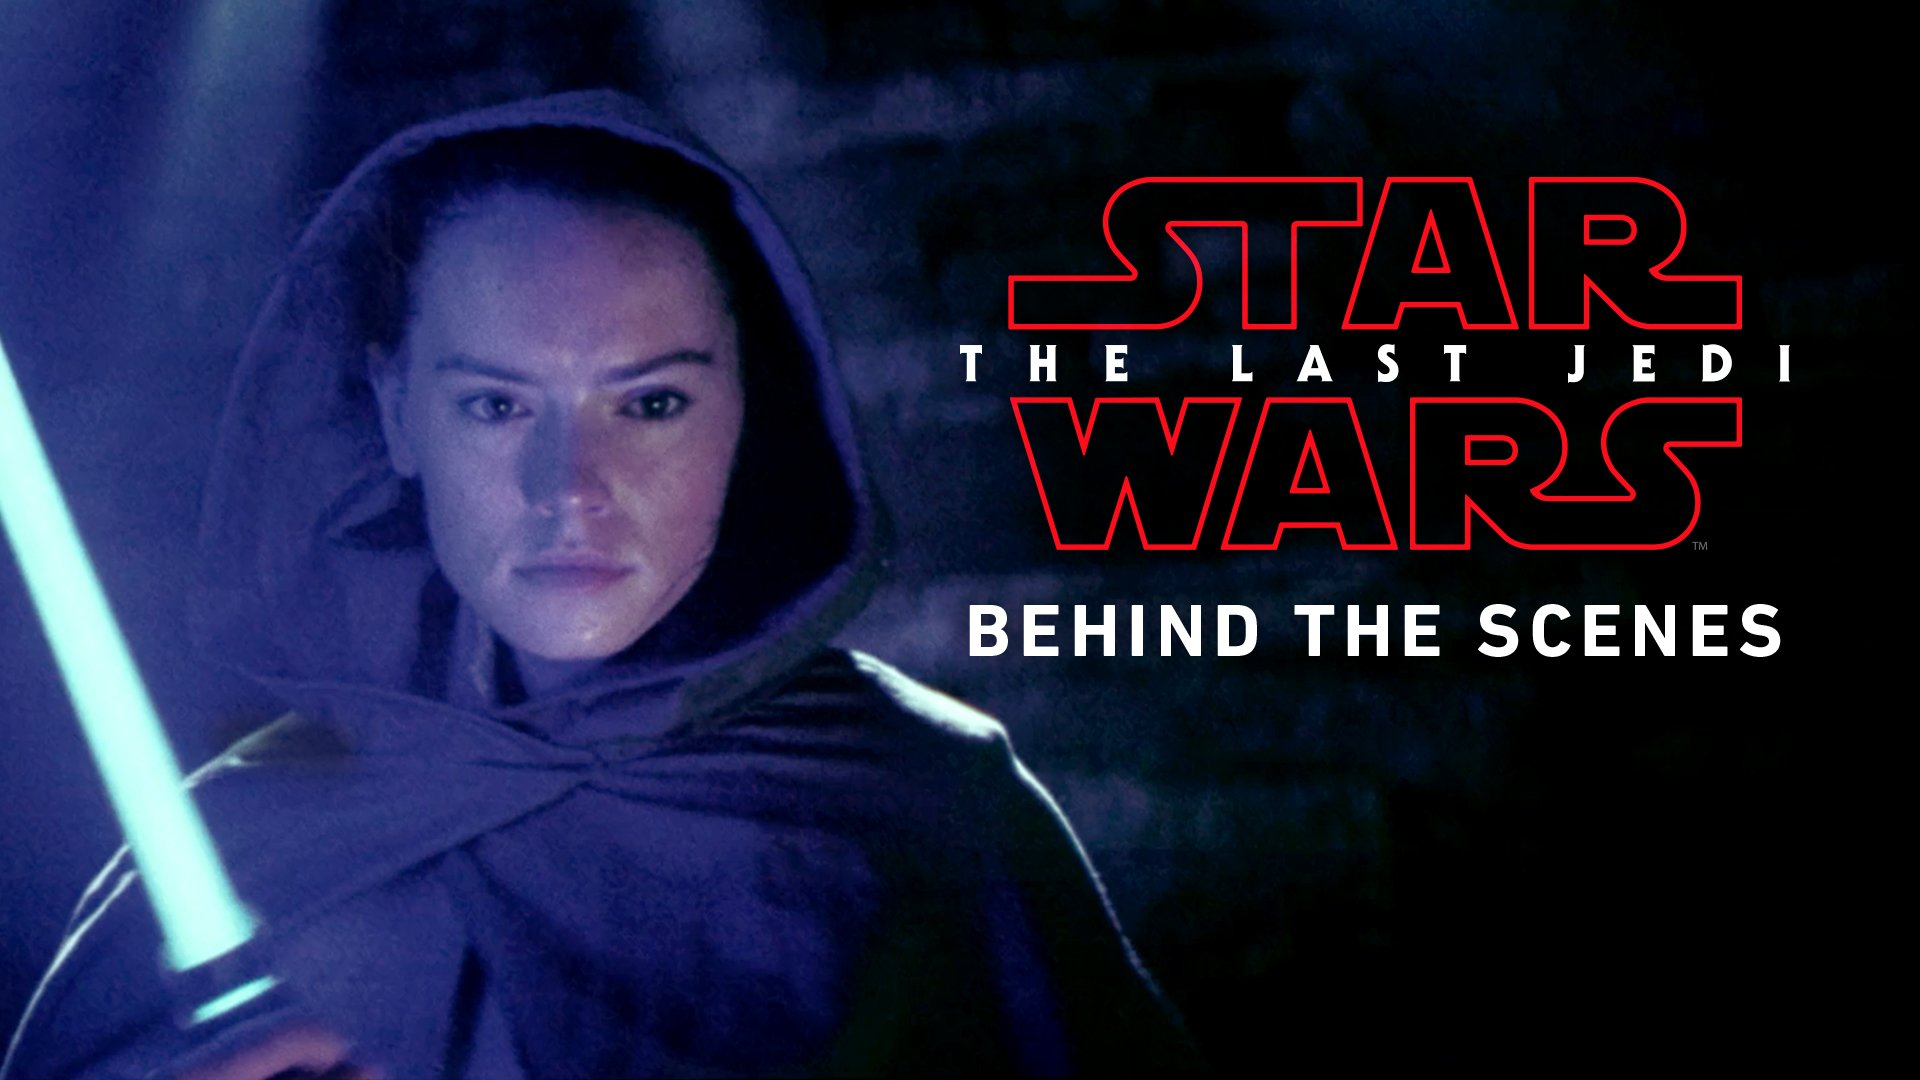 RT @starwars: Go behind the scenes of Star Wars: #TheLastJedi. In theaters December 15. https://t.co/5hFtptIrmJ